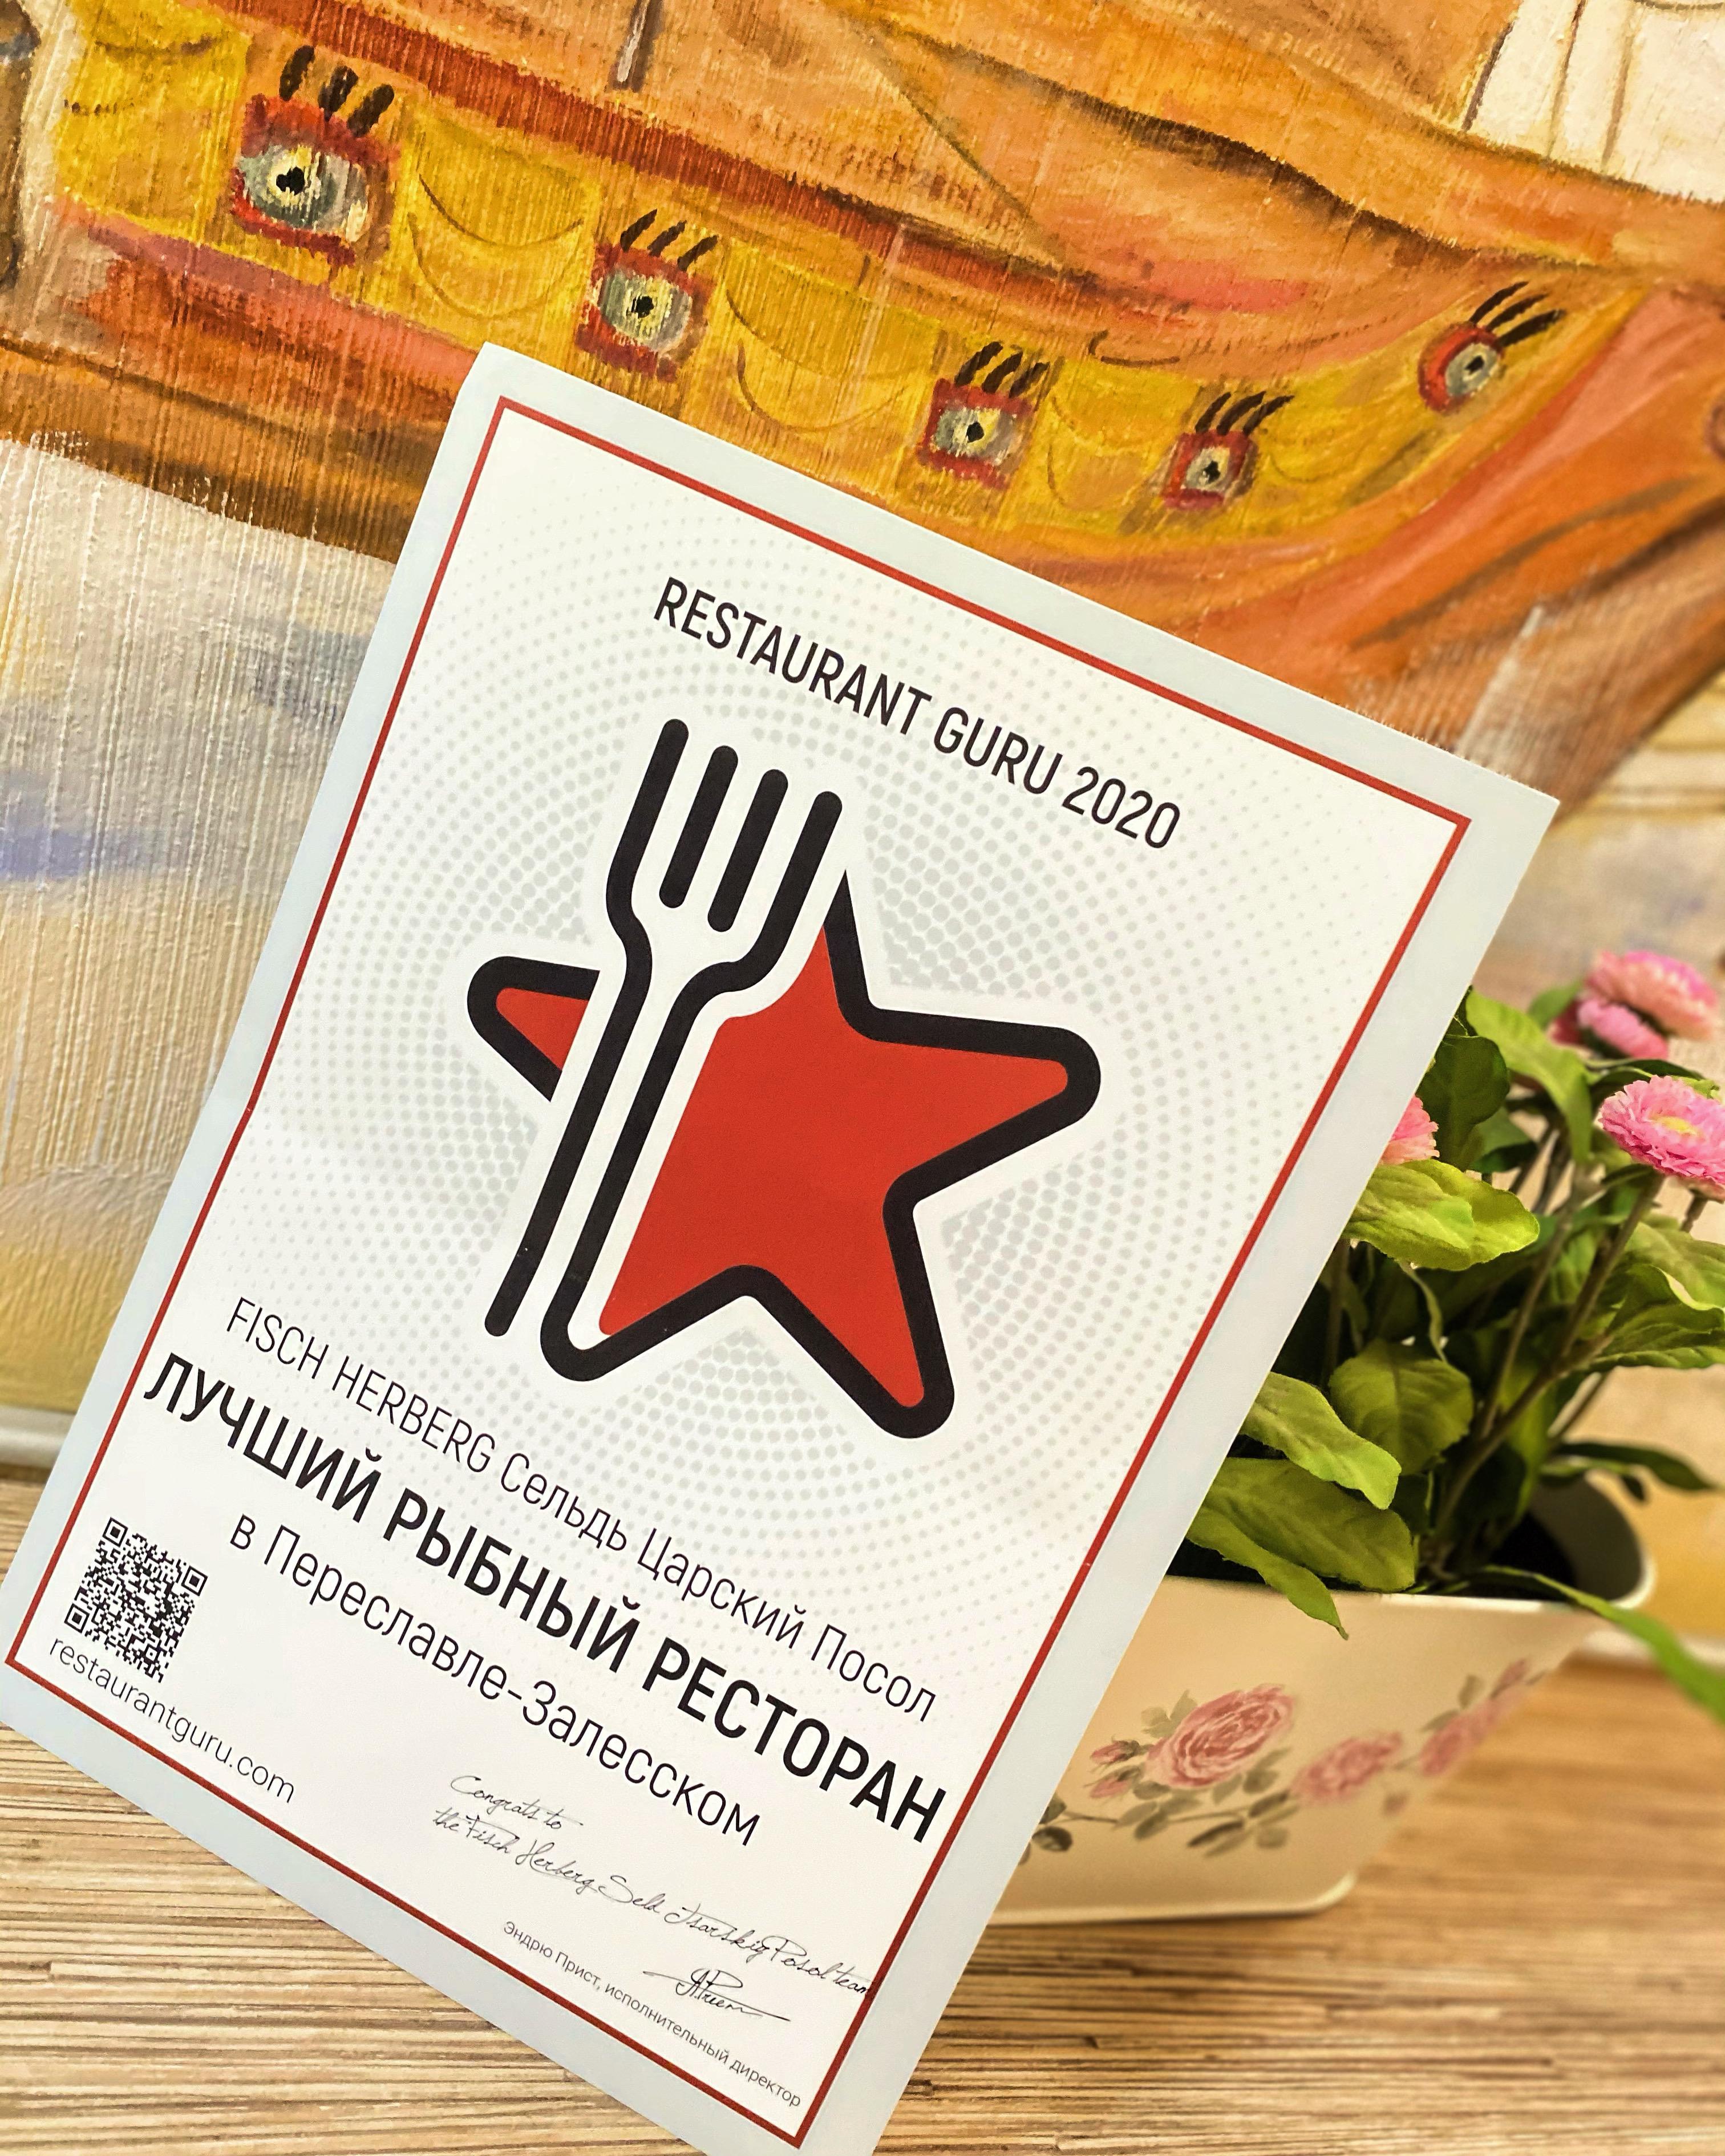 FISCH HERBERG Сельдь Царский Посол award